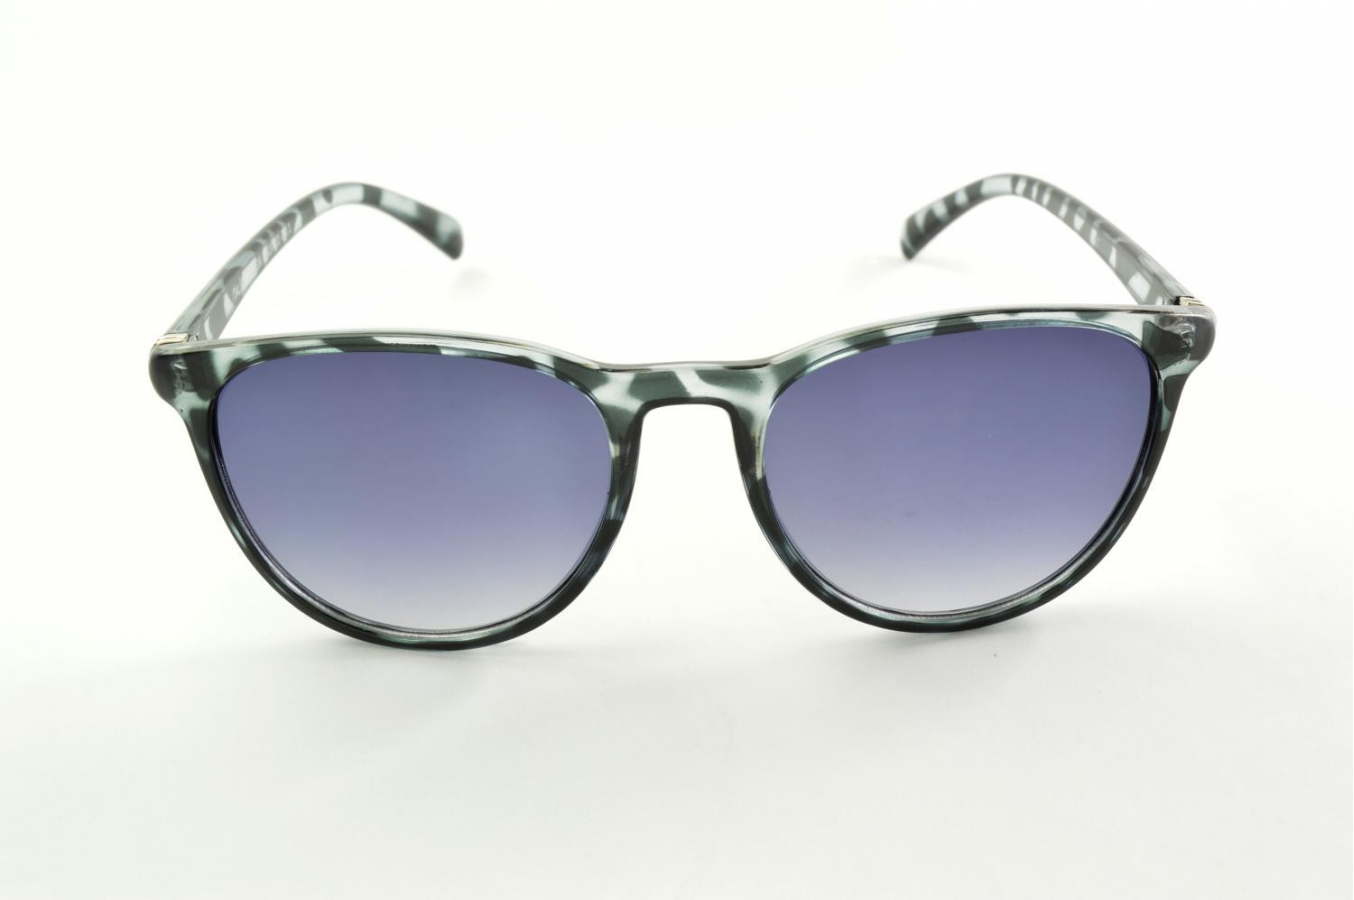 Butterfly Shaped Eye Glasses | Louisiana Bucket Brigade